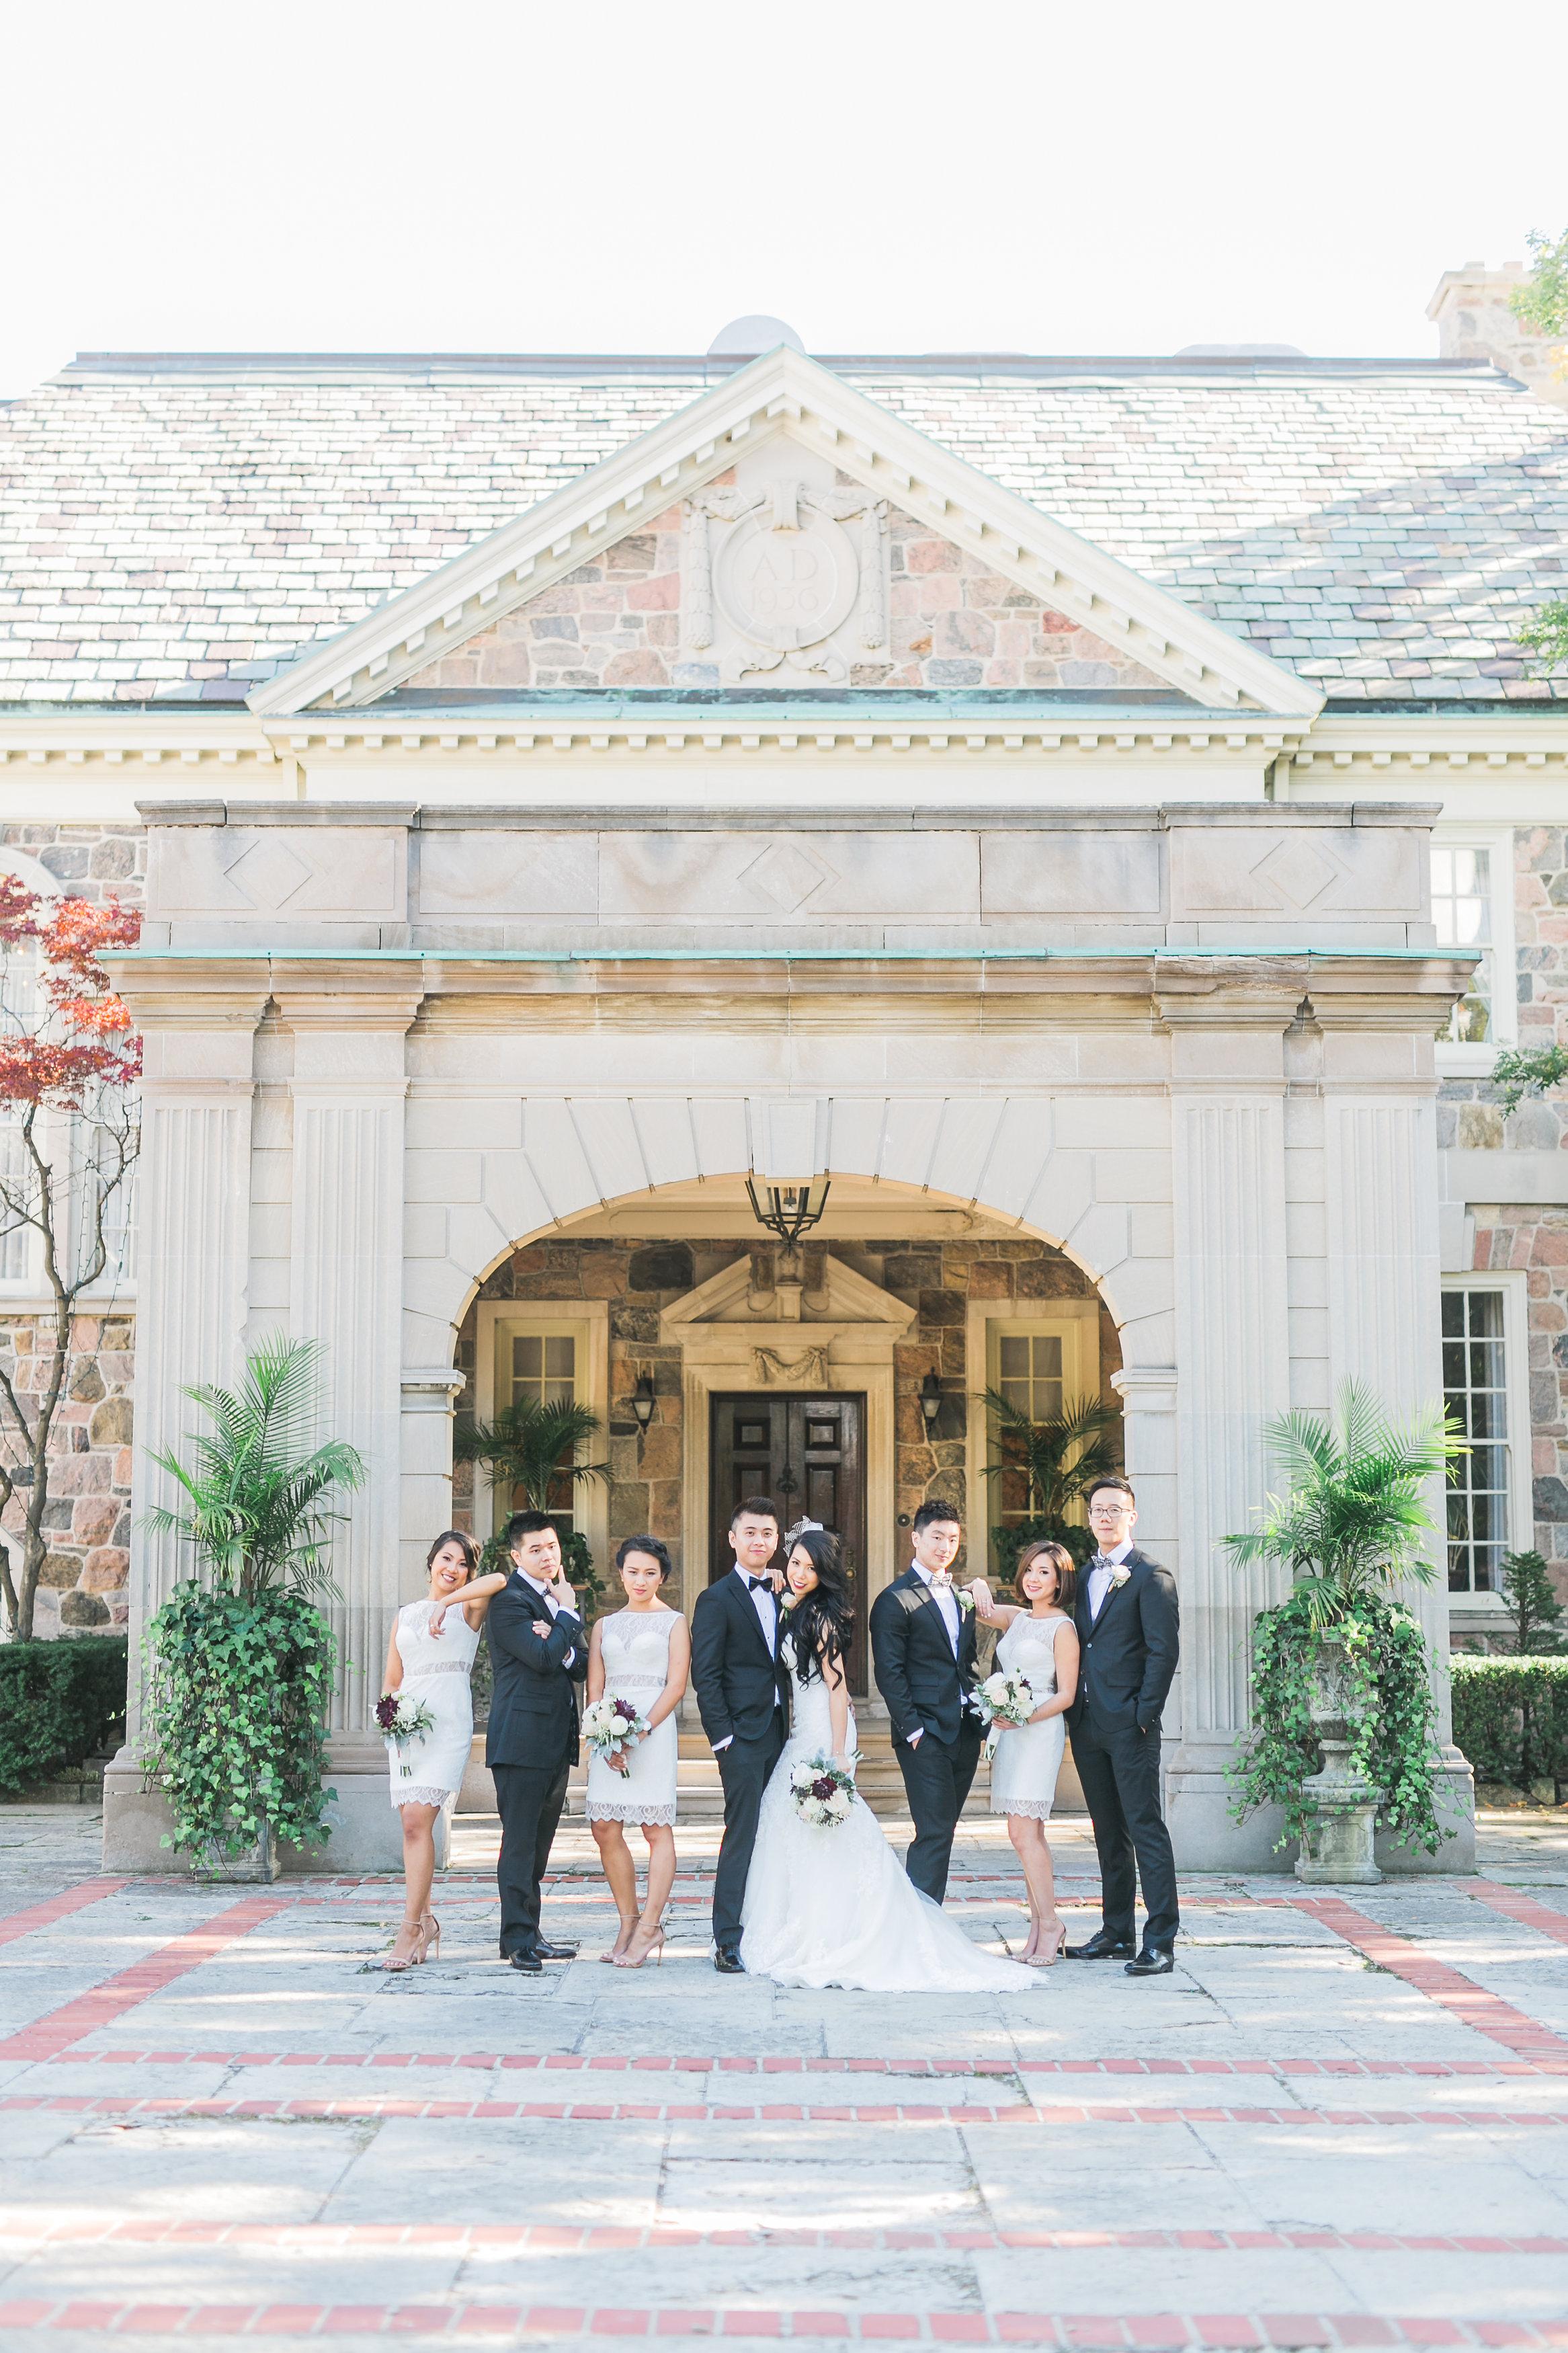 Phoebe Lo Events Toronto Wedding - Graydon Hall Manor Garden Charm Event 013.jpg